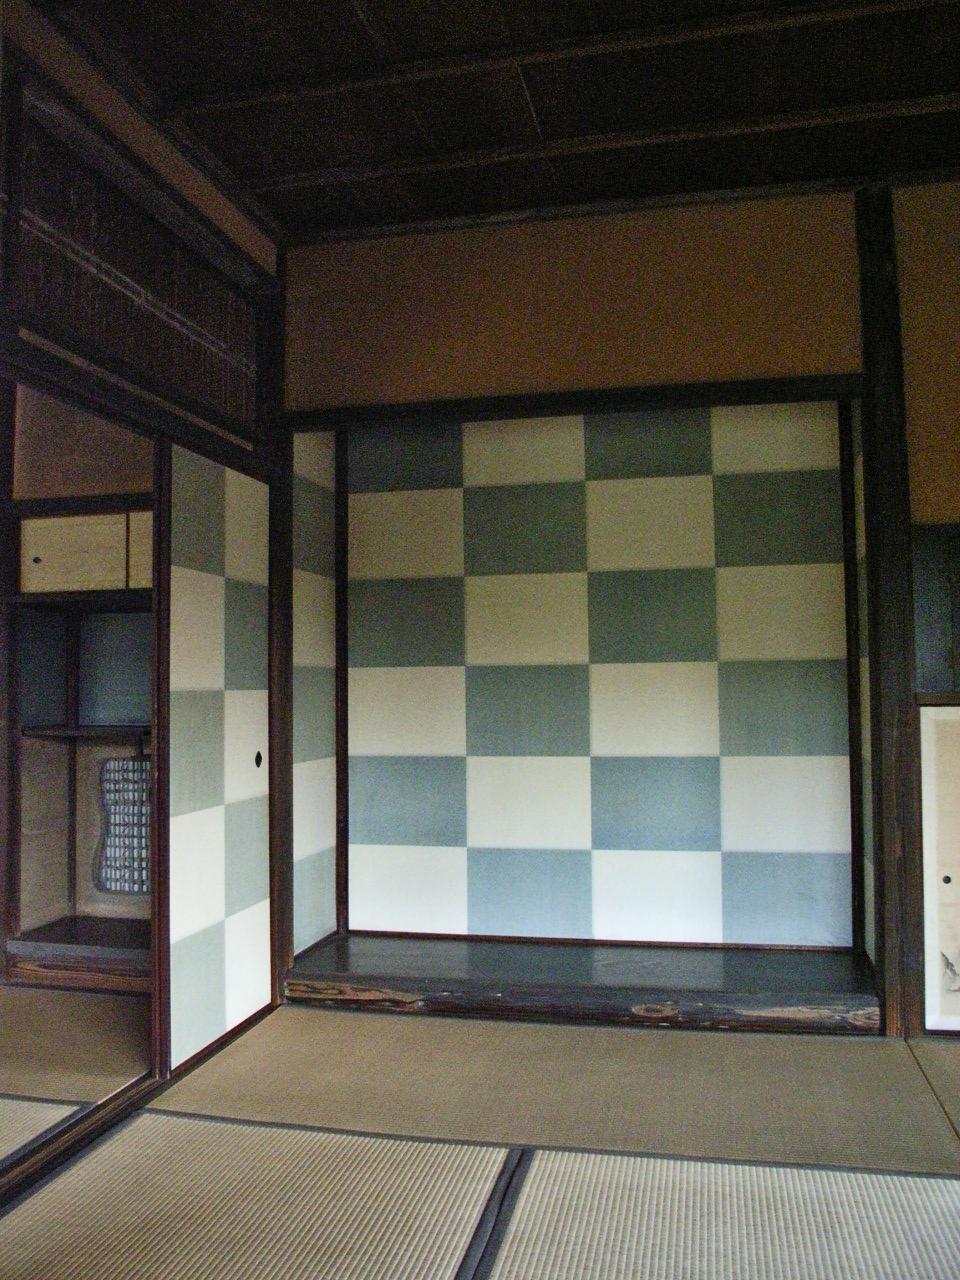 Katsura Imperial Villa kyoto japan 2016.4 桂離宮に行ってきました(^_^)v